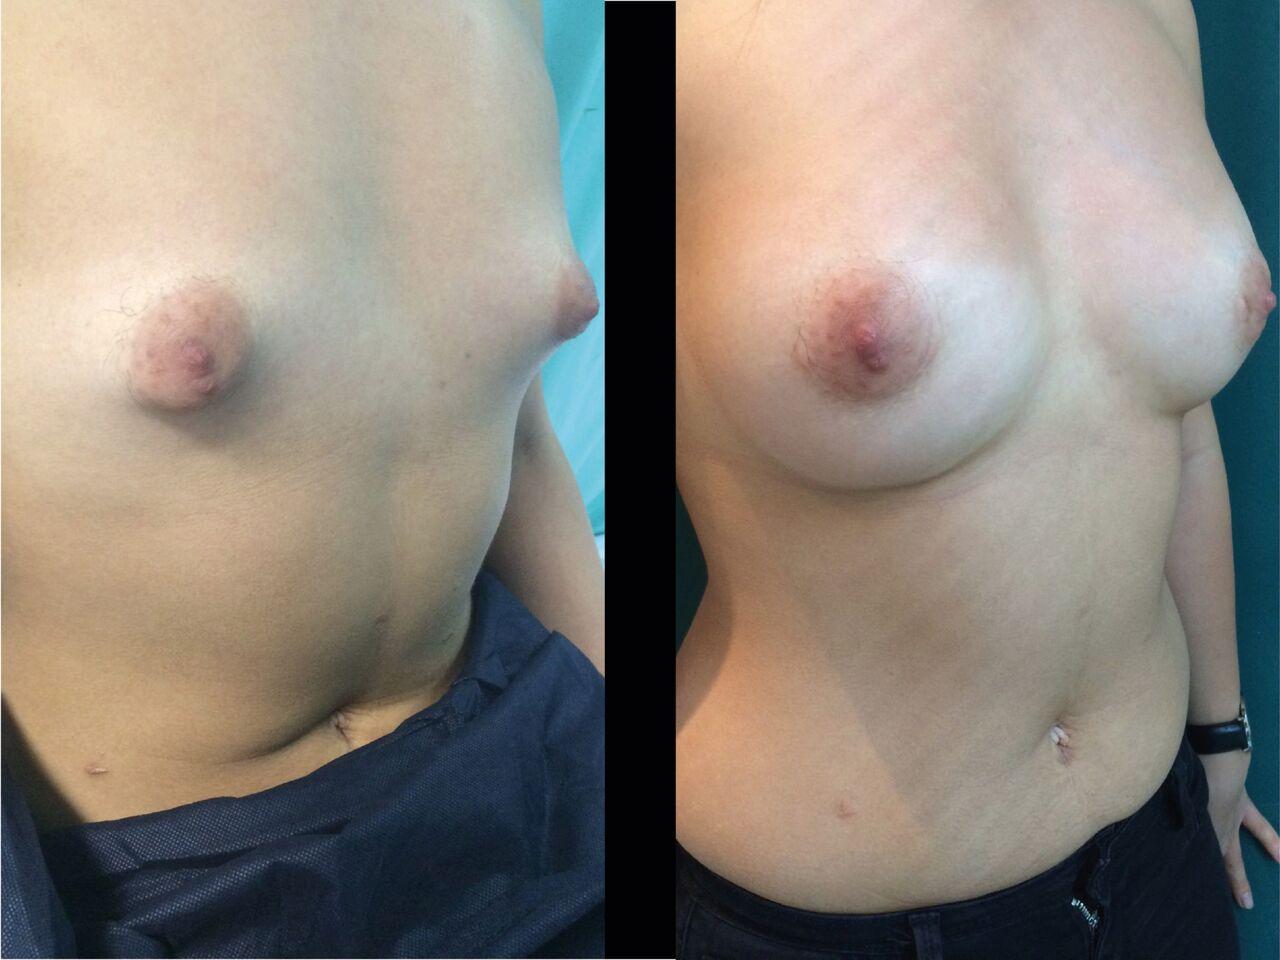 Pose Mammaire Chirurgie Esthetique Pose Implants mammaires Nyon